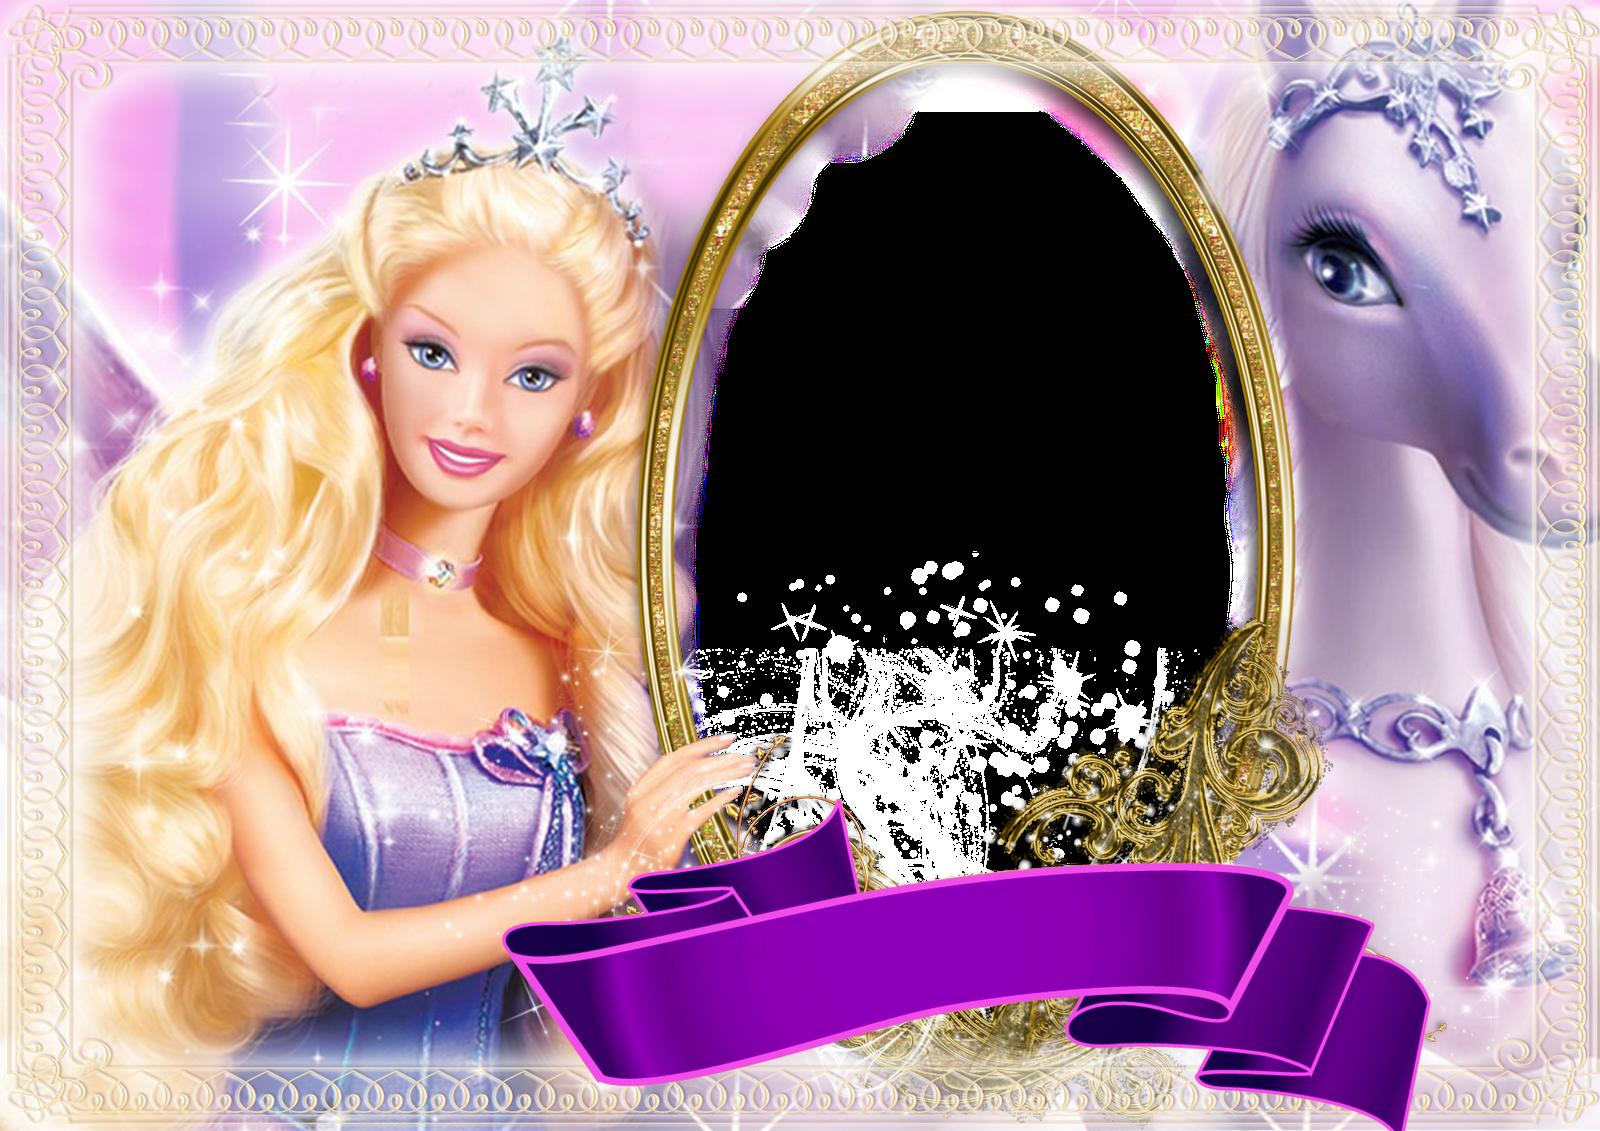 barbie frame - Google Search | barbie party | Pinterest | Barbie ...